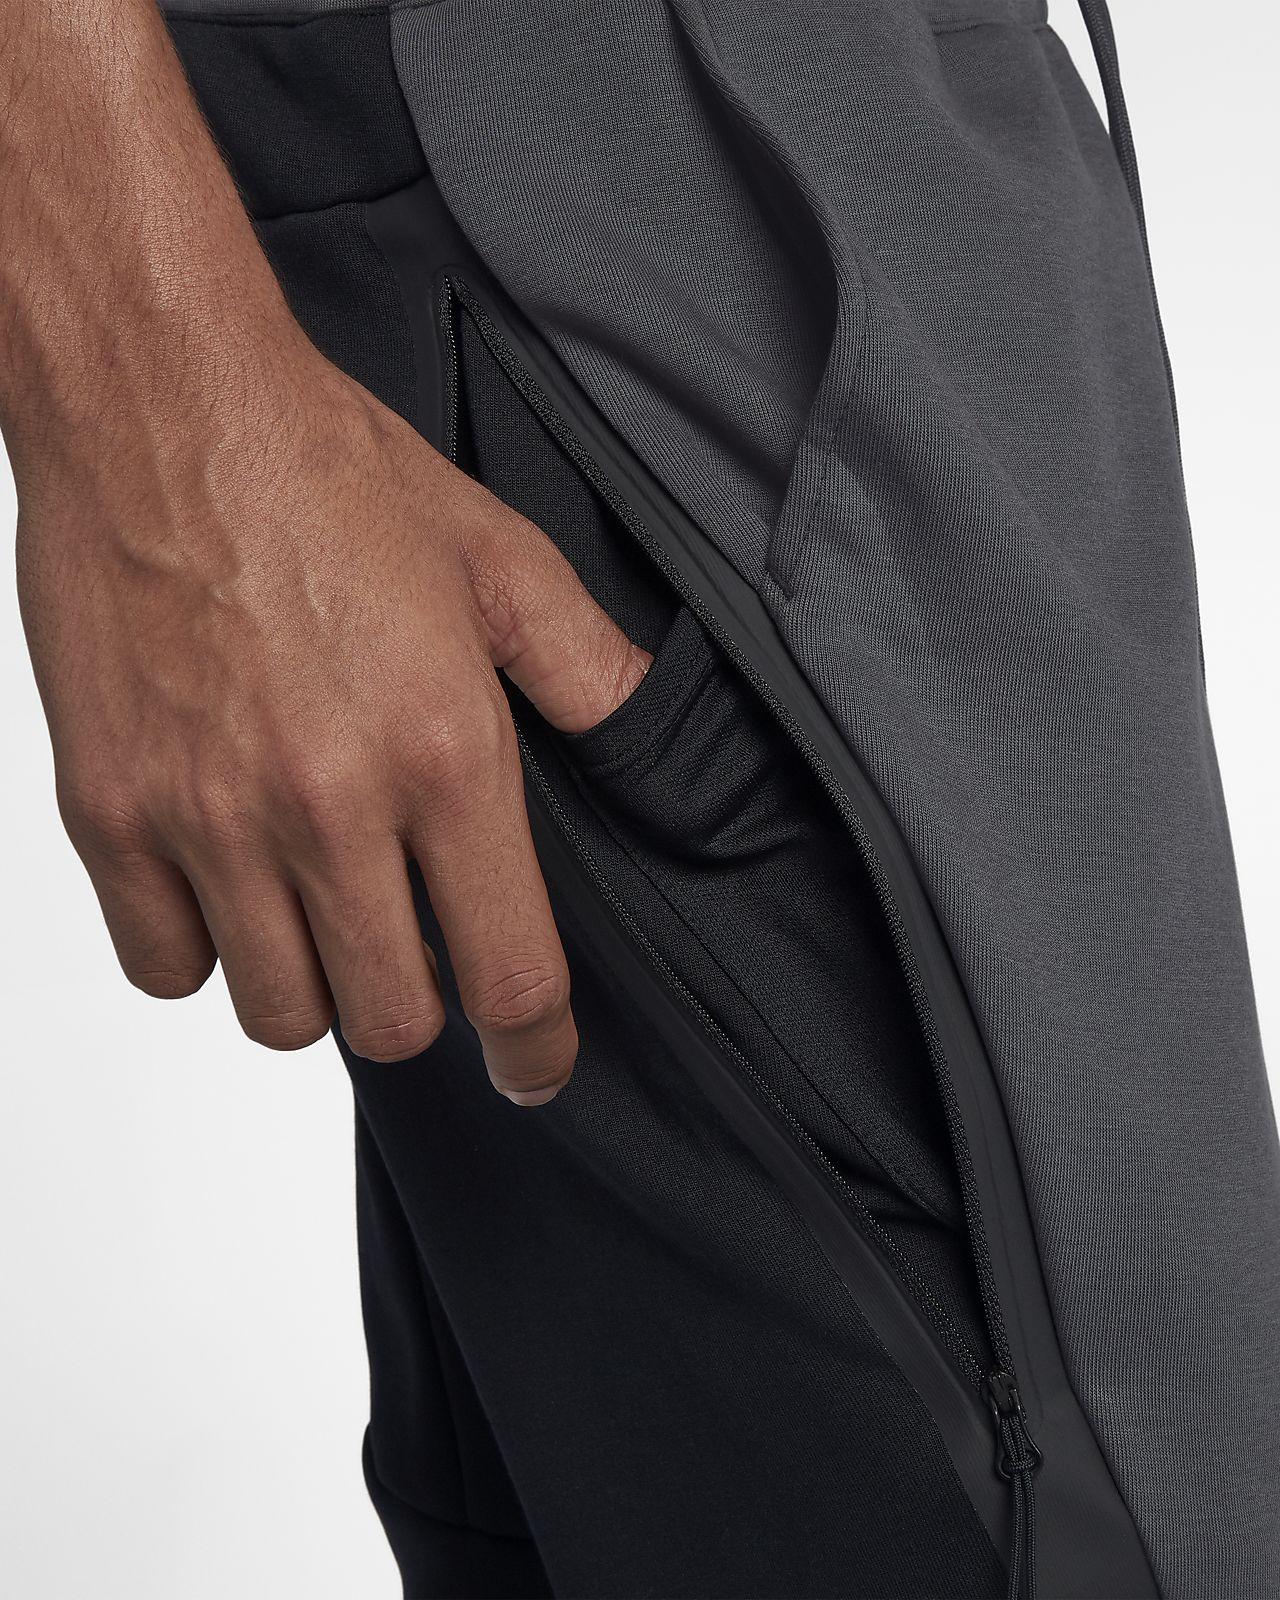 online retailer b6c3a d3346 ... Joggingbyxor Nike Sportswear Tech Fleece för män